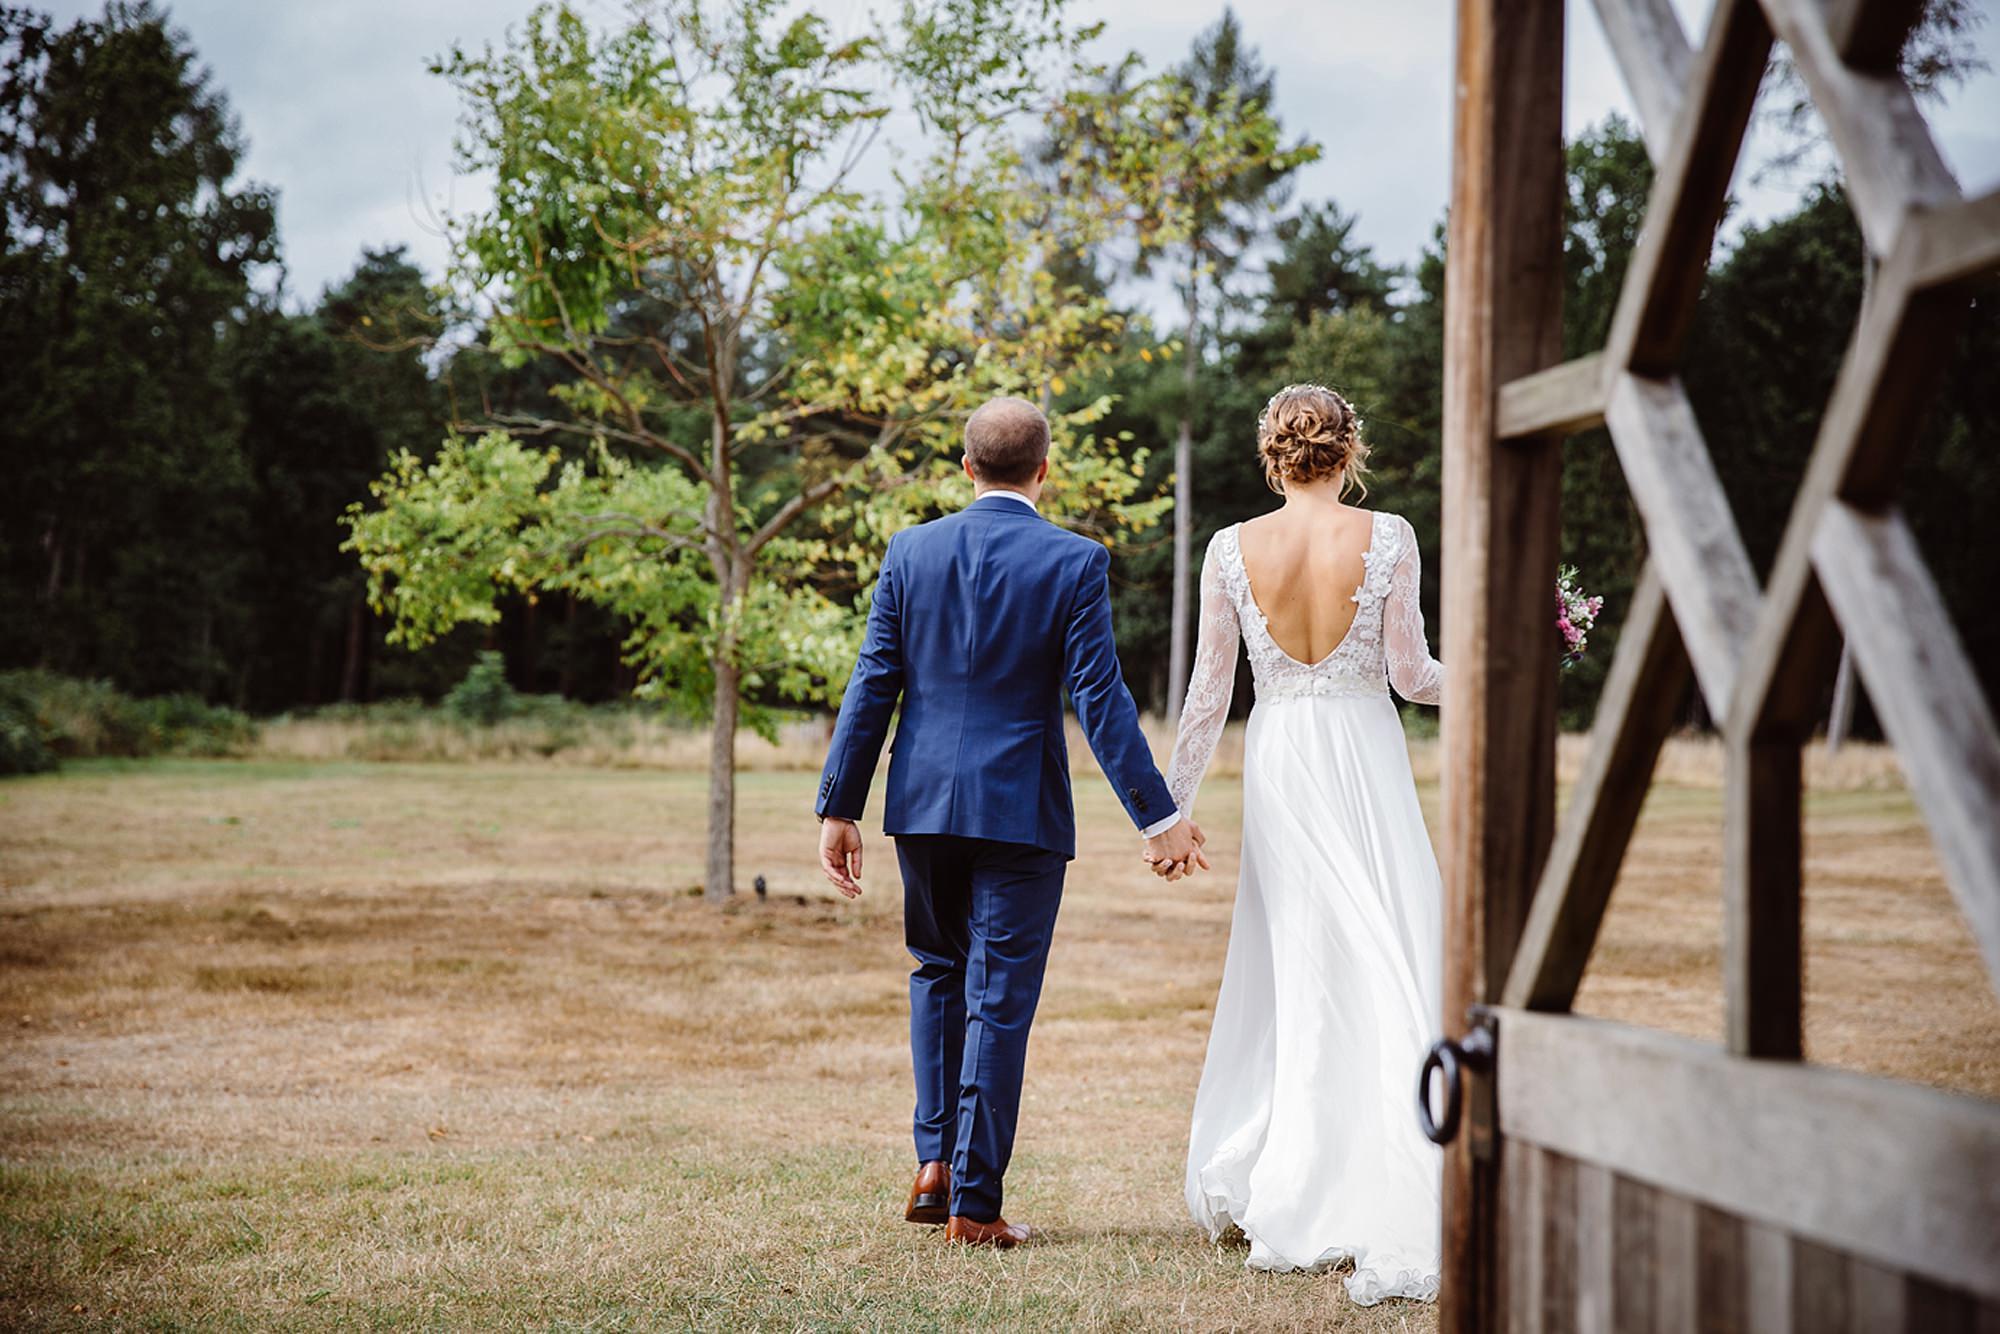 Marks Hall Estate wedding photography bride and groom going through door